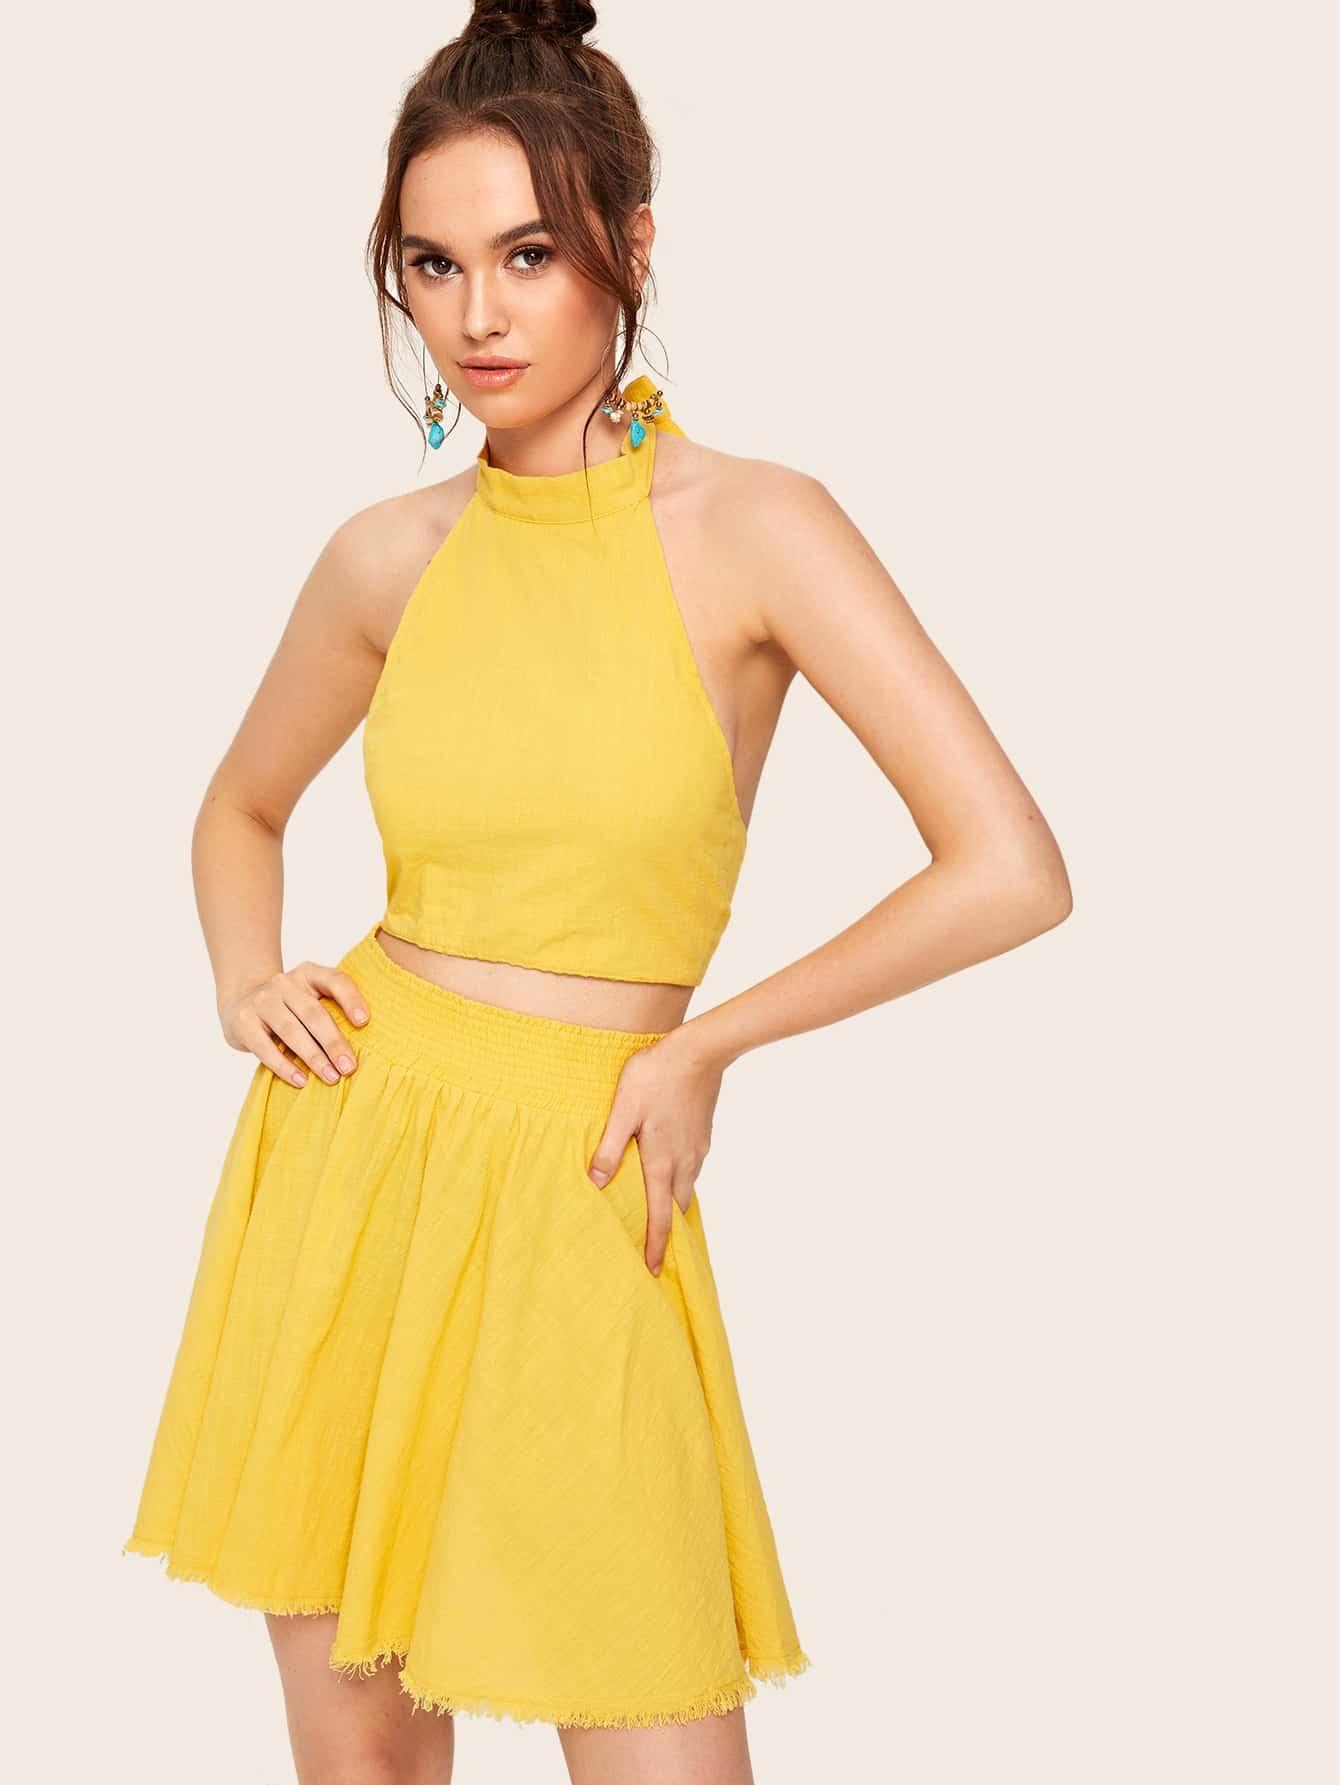 Фото - Юбку и топ-халтер с узлом сзади от SheIn желтого цвета